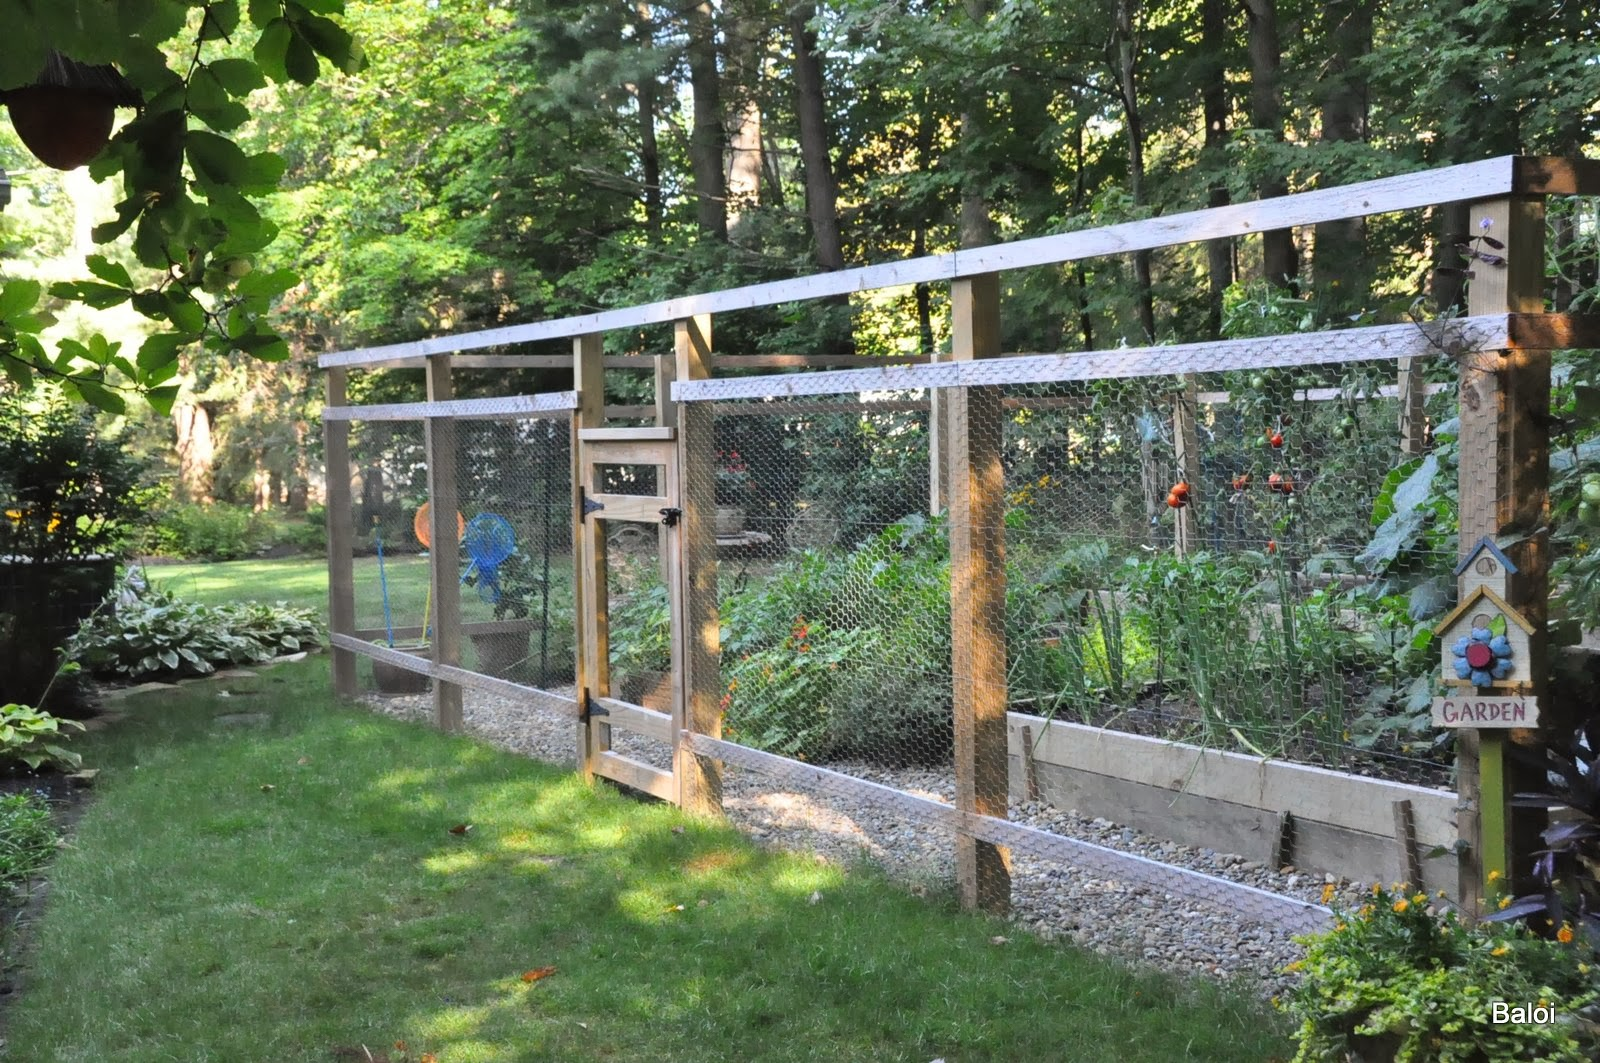 Vegetable garden fence ideas - Gardeners With Kids The Vegetable Garden Fence